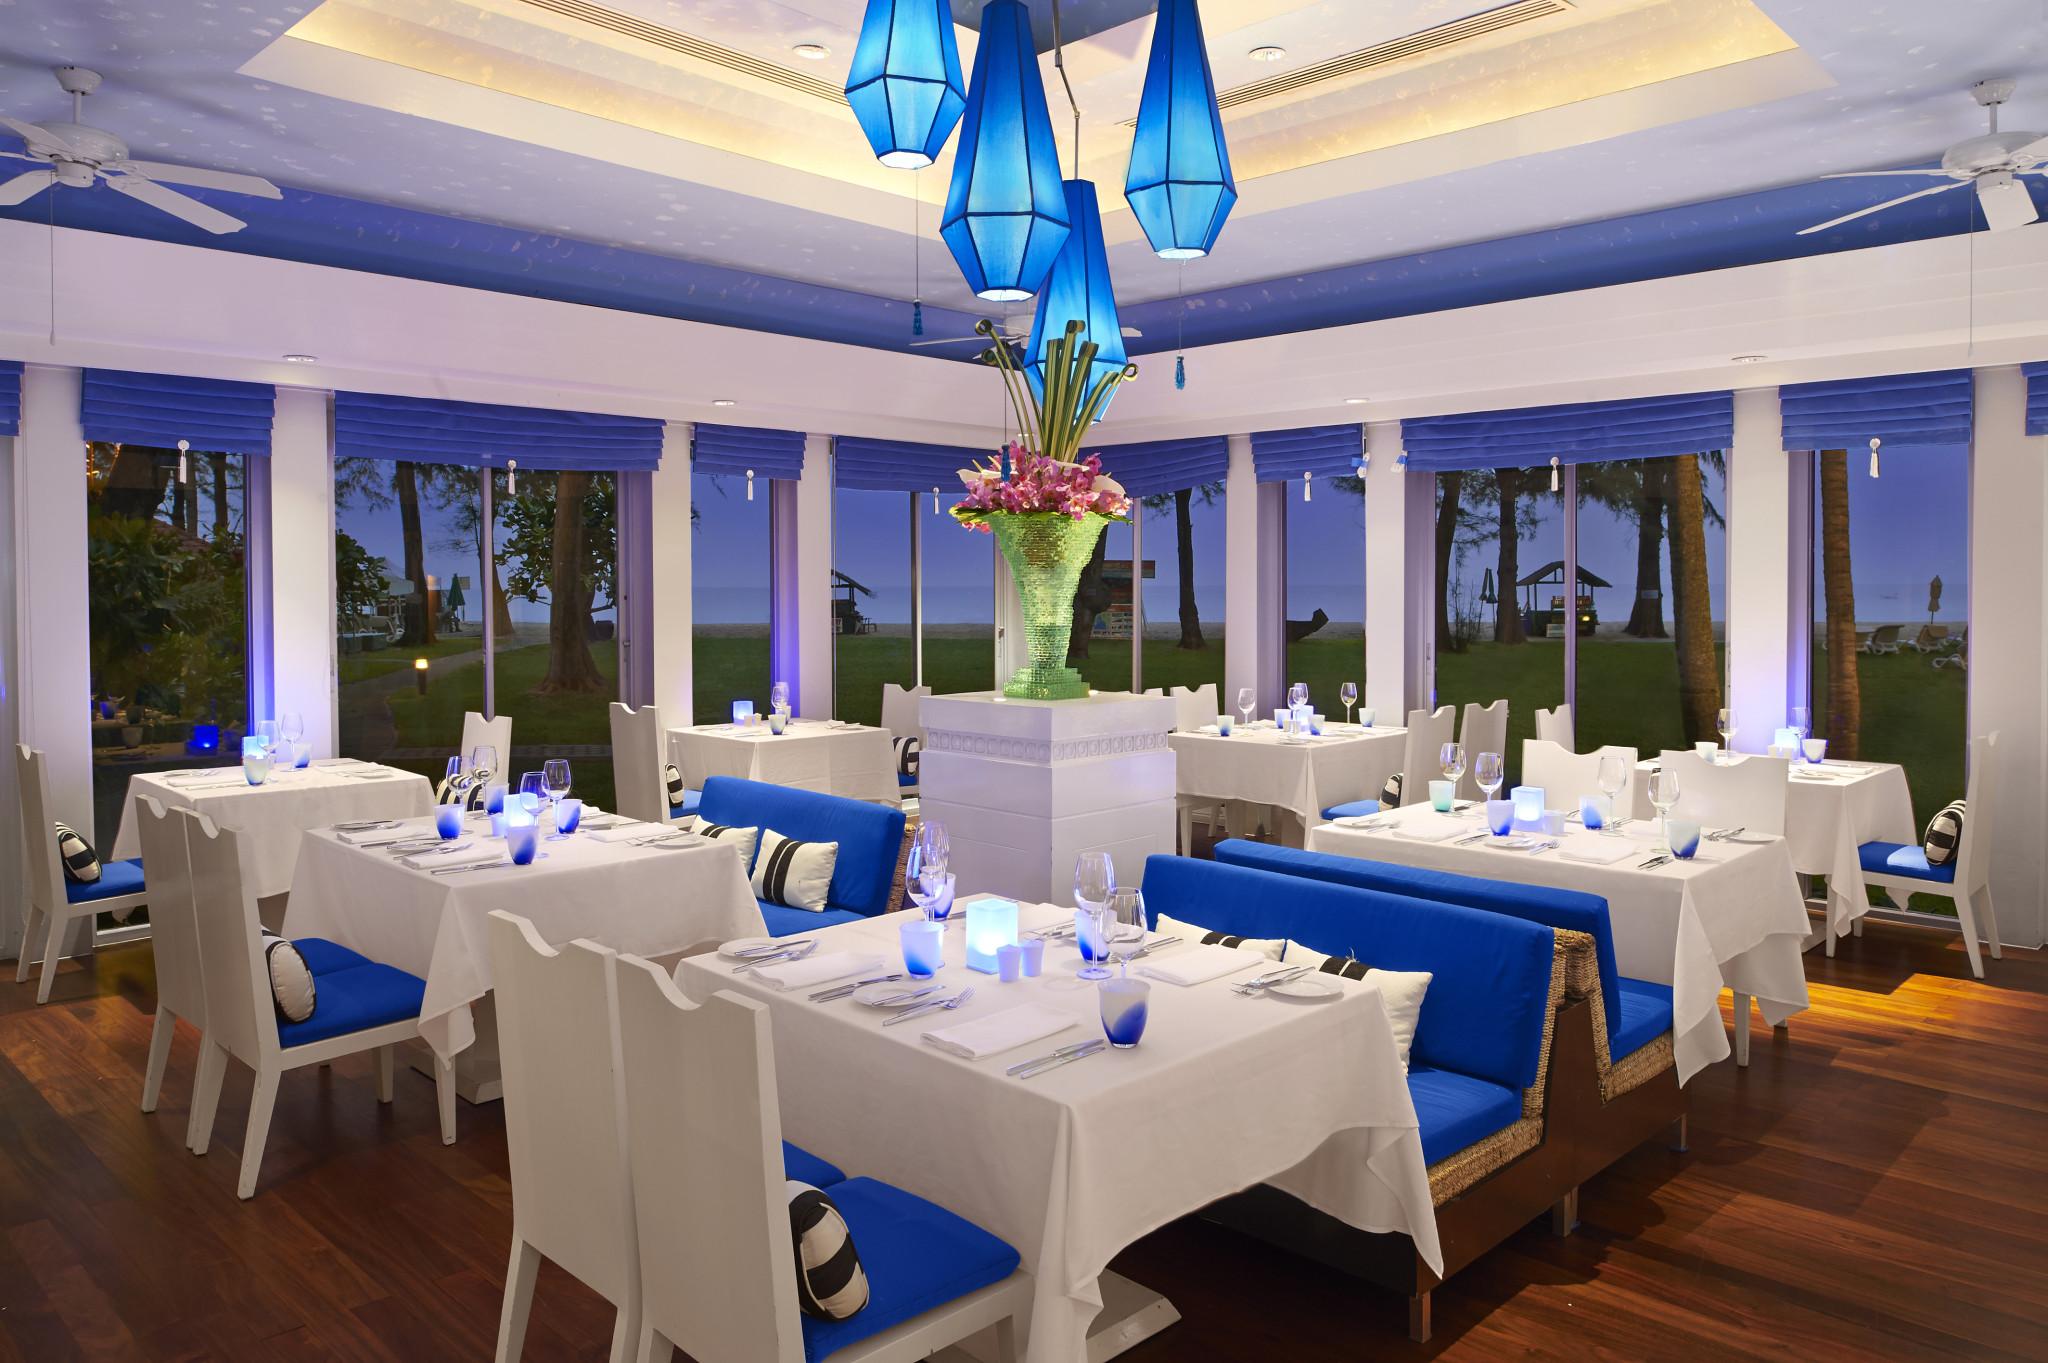 9. La Trattoria Italian Restaurant